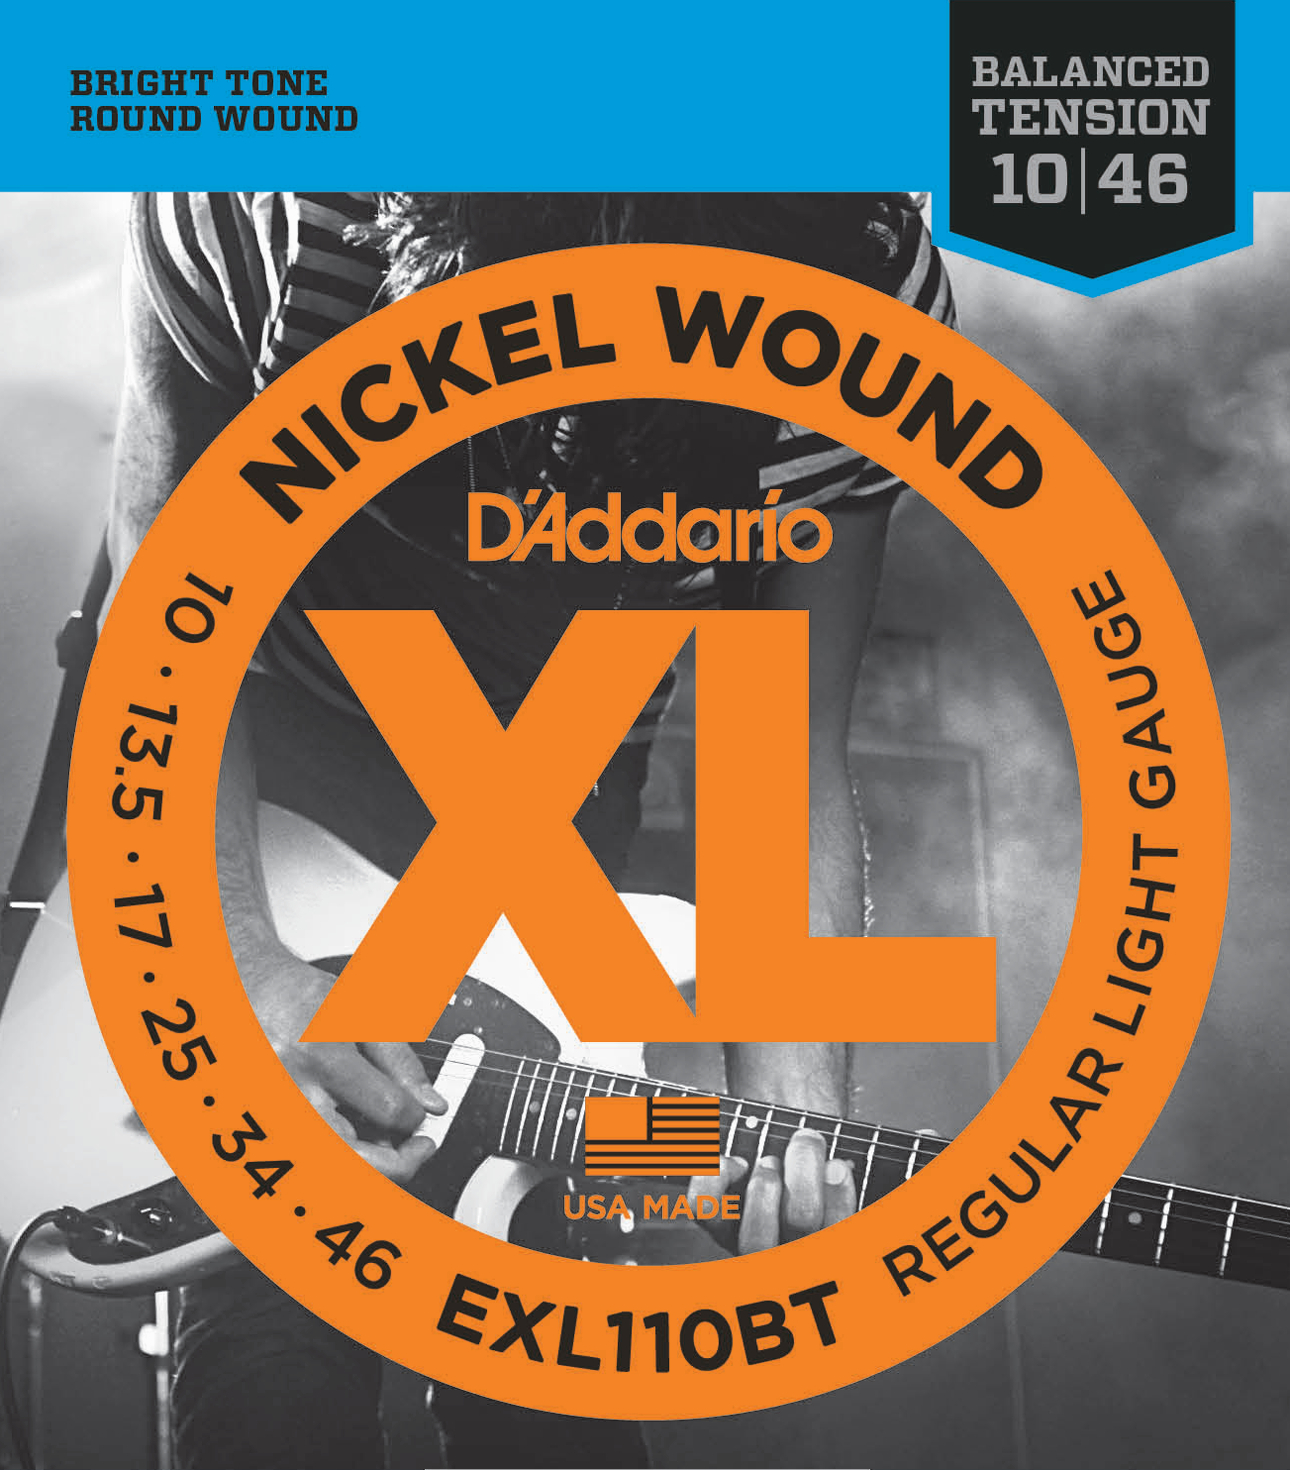 D'Addario EXL110BT Nickel Wound Electric Guitar Strings Balanced Tension Regular...